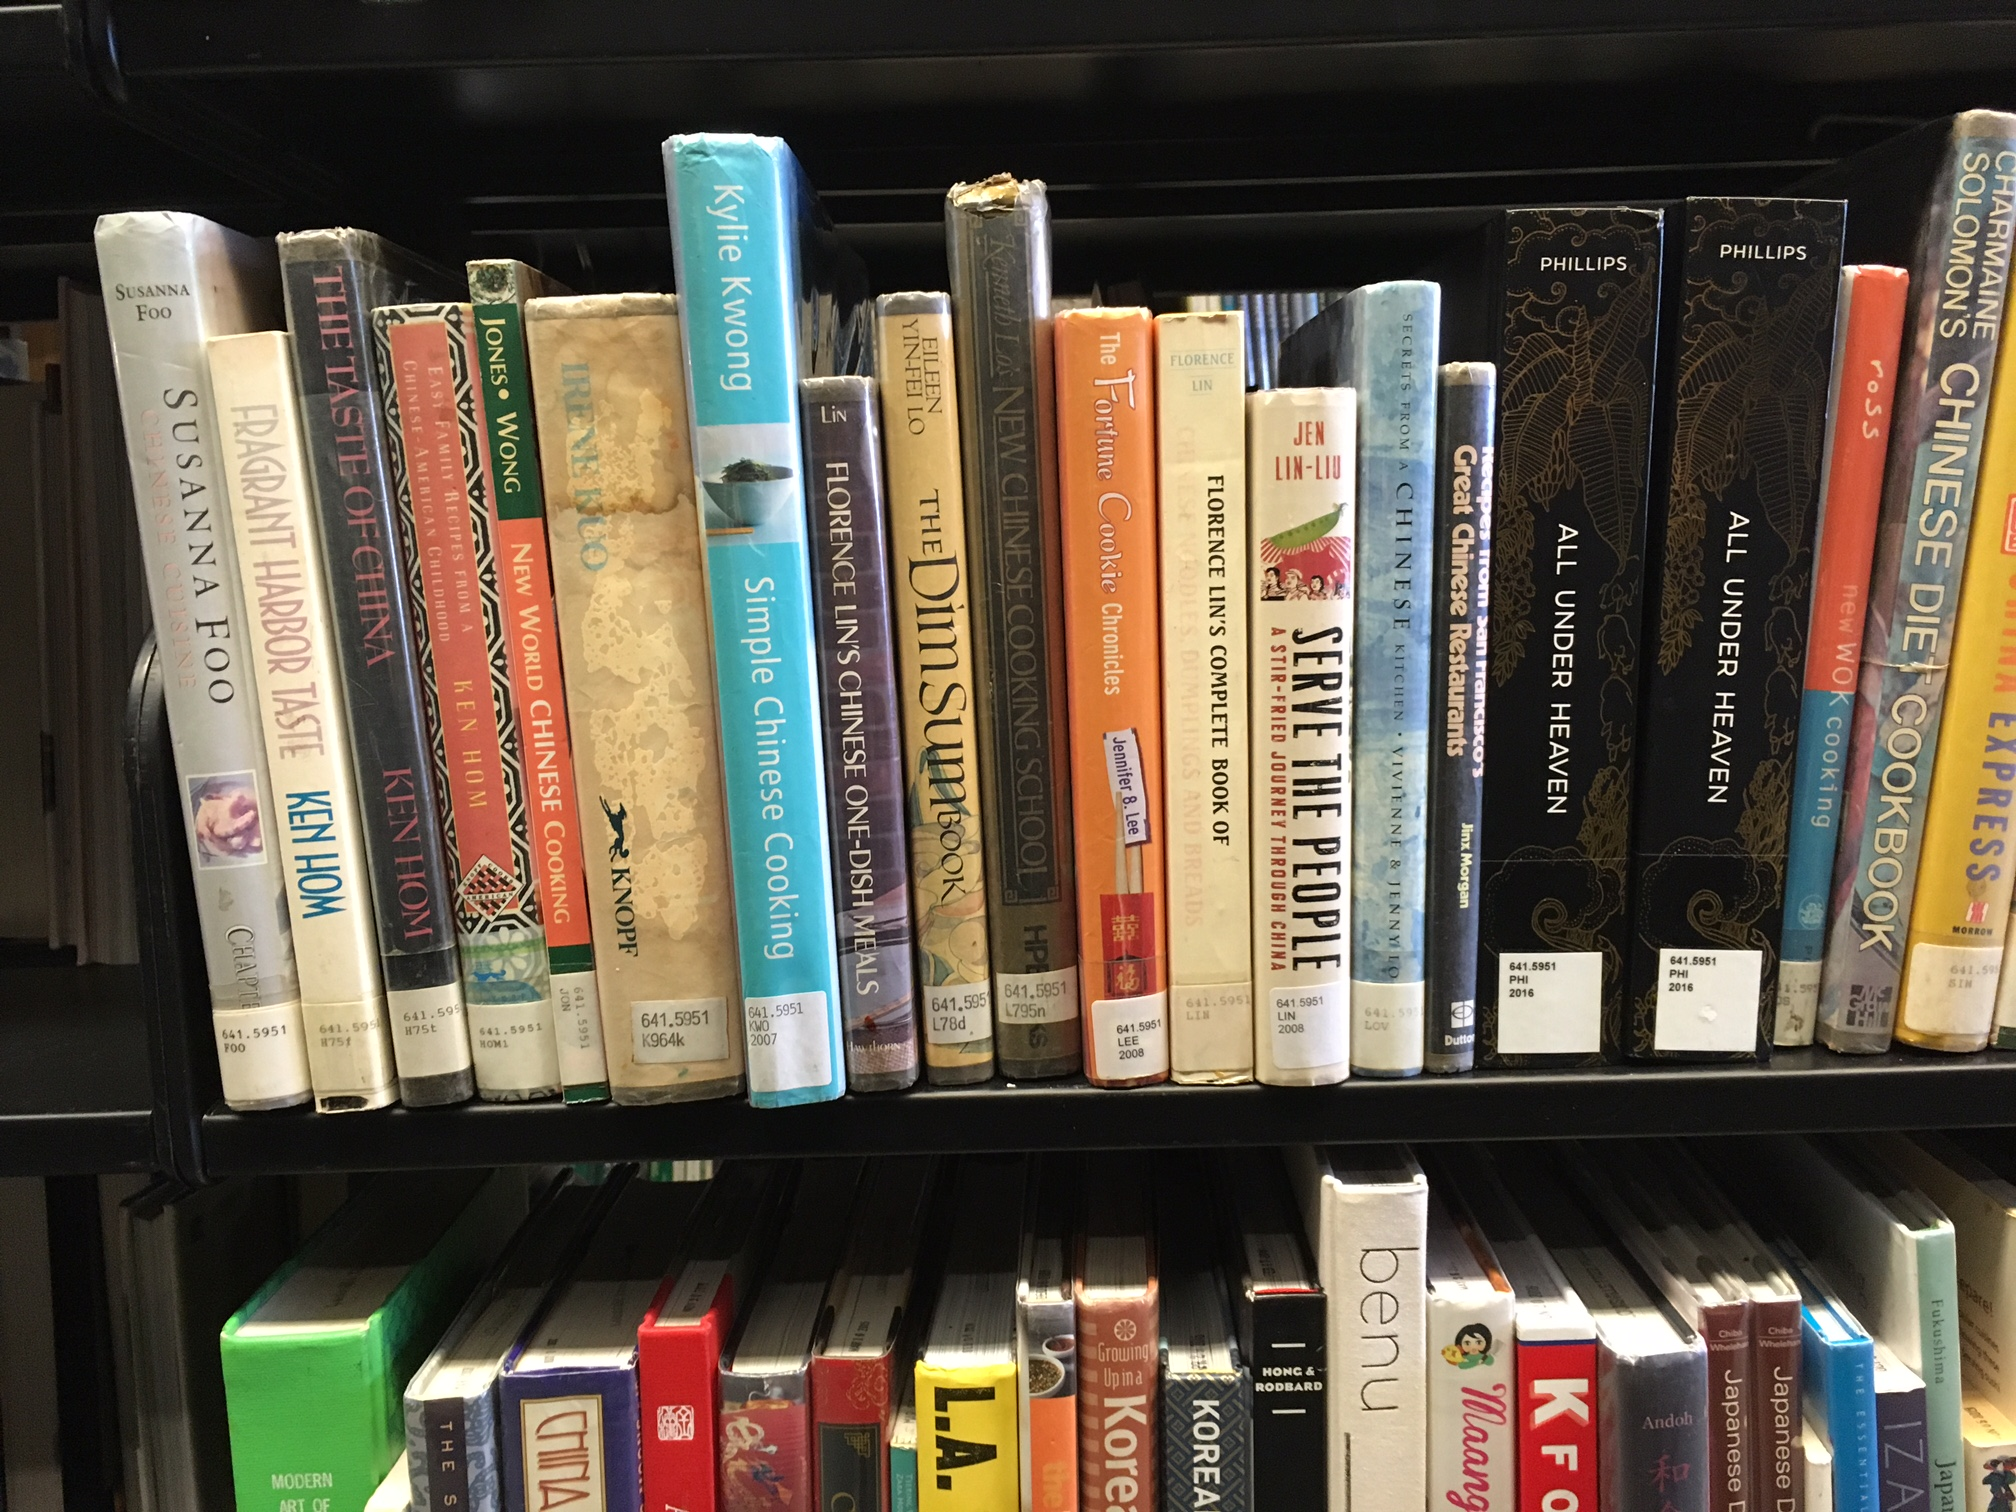 booksmart - photo #25